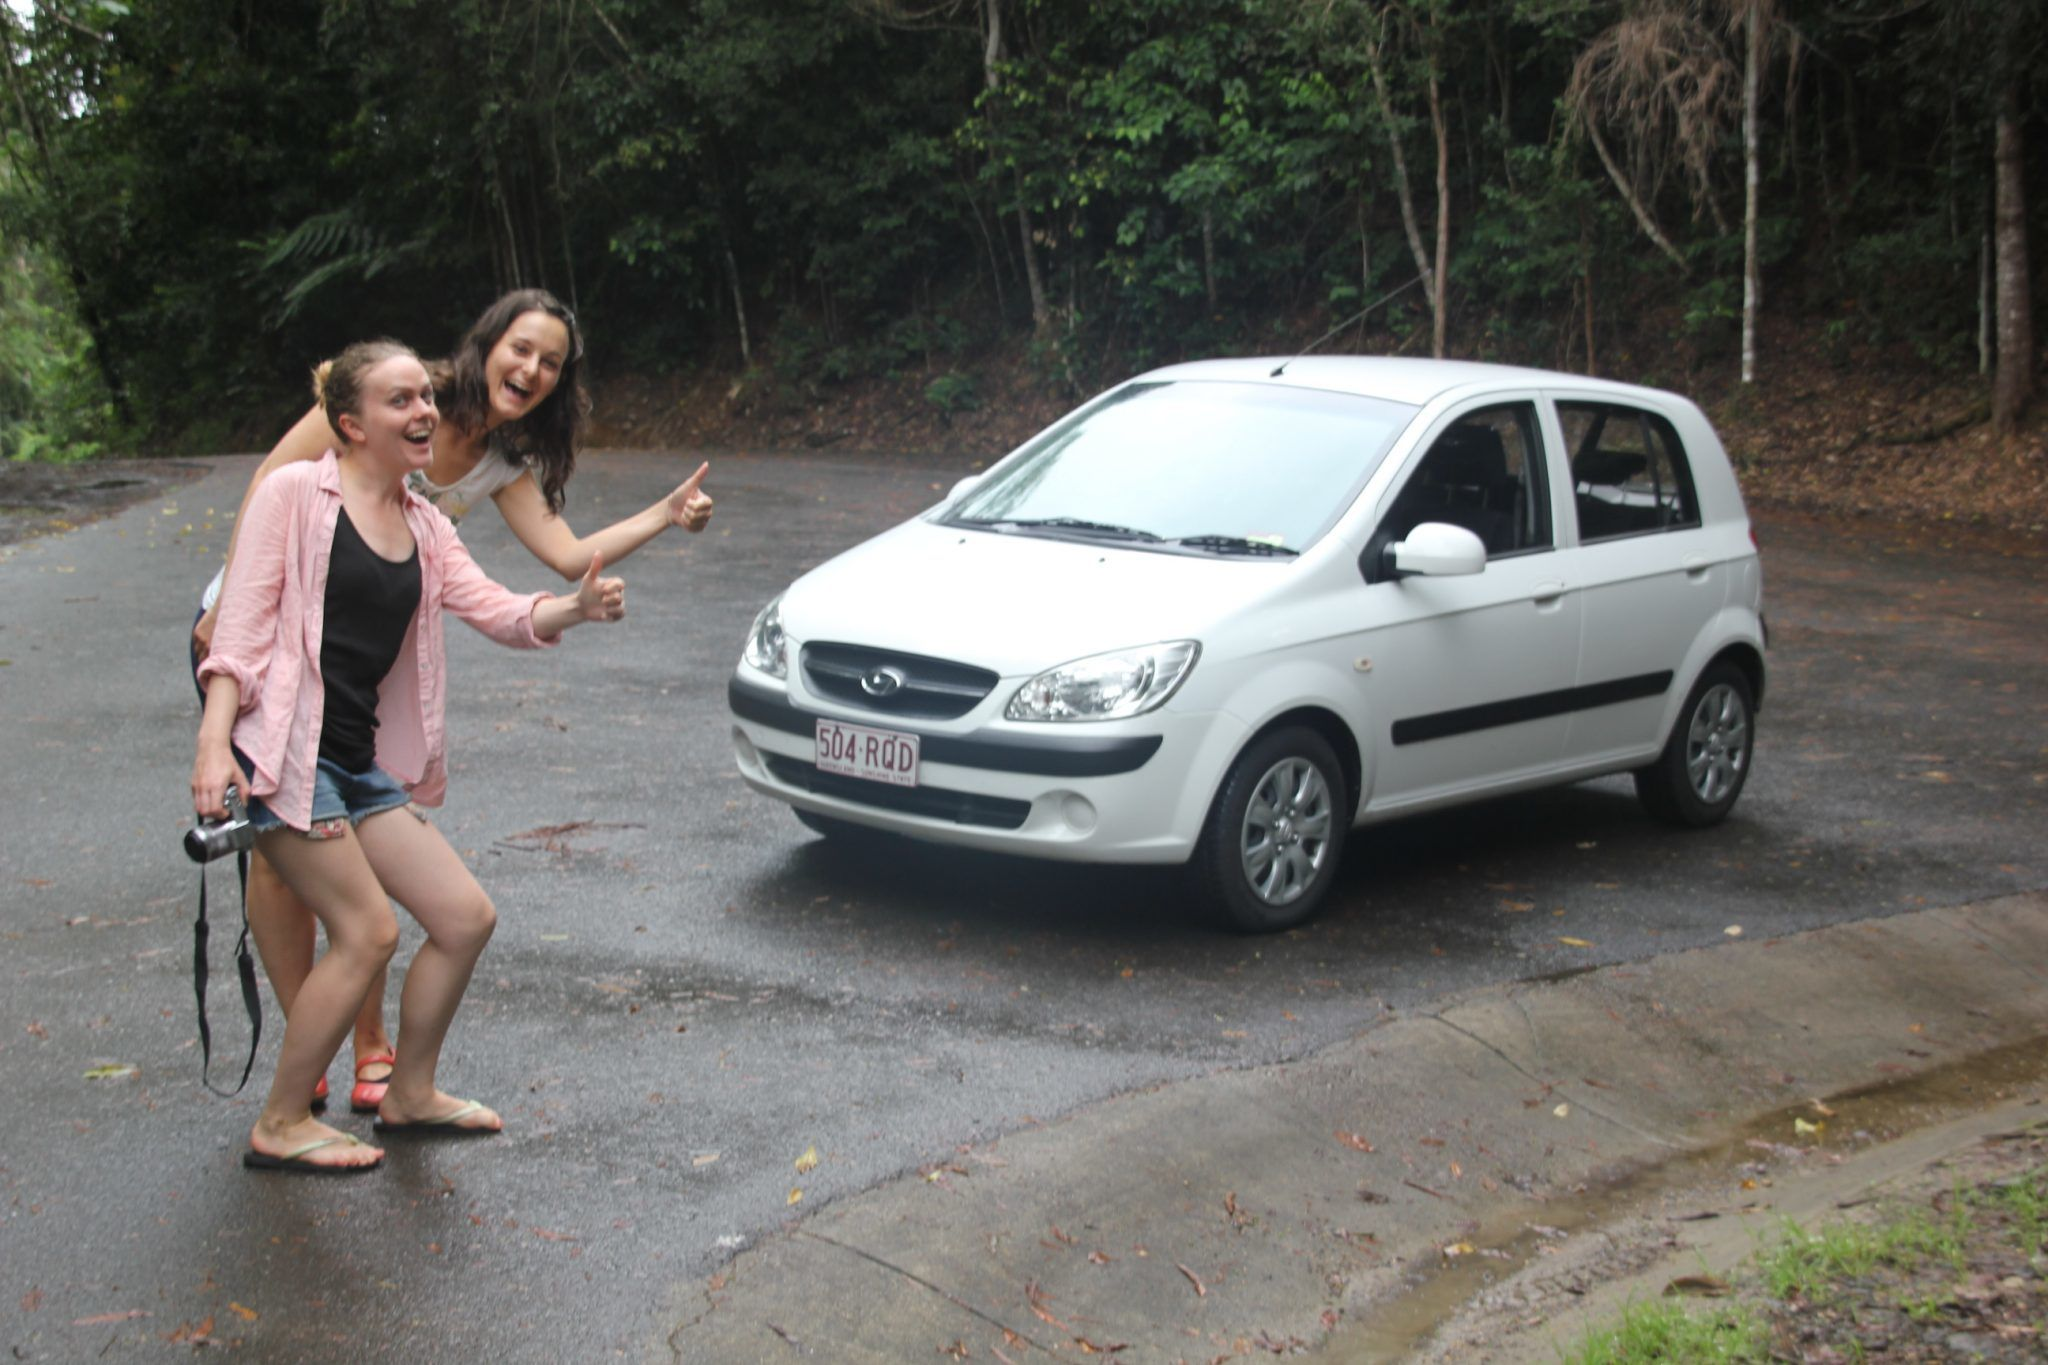 en-komik-kibris-rent-a-car-musterisi